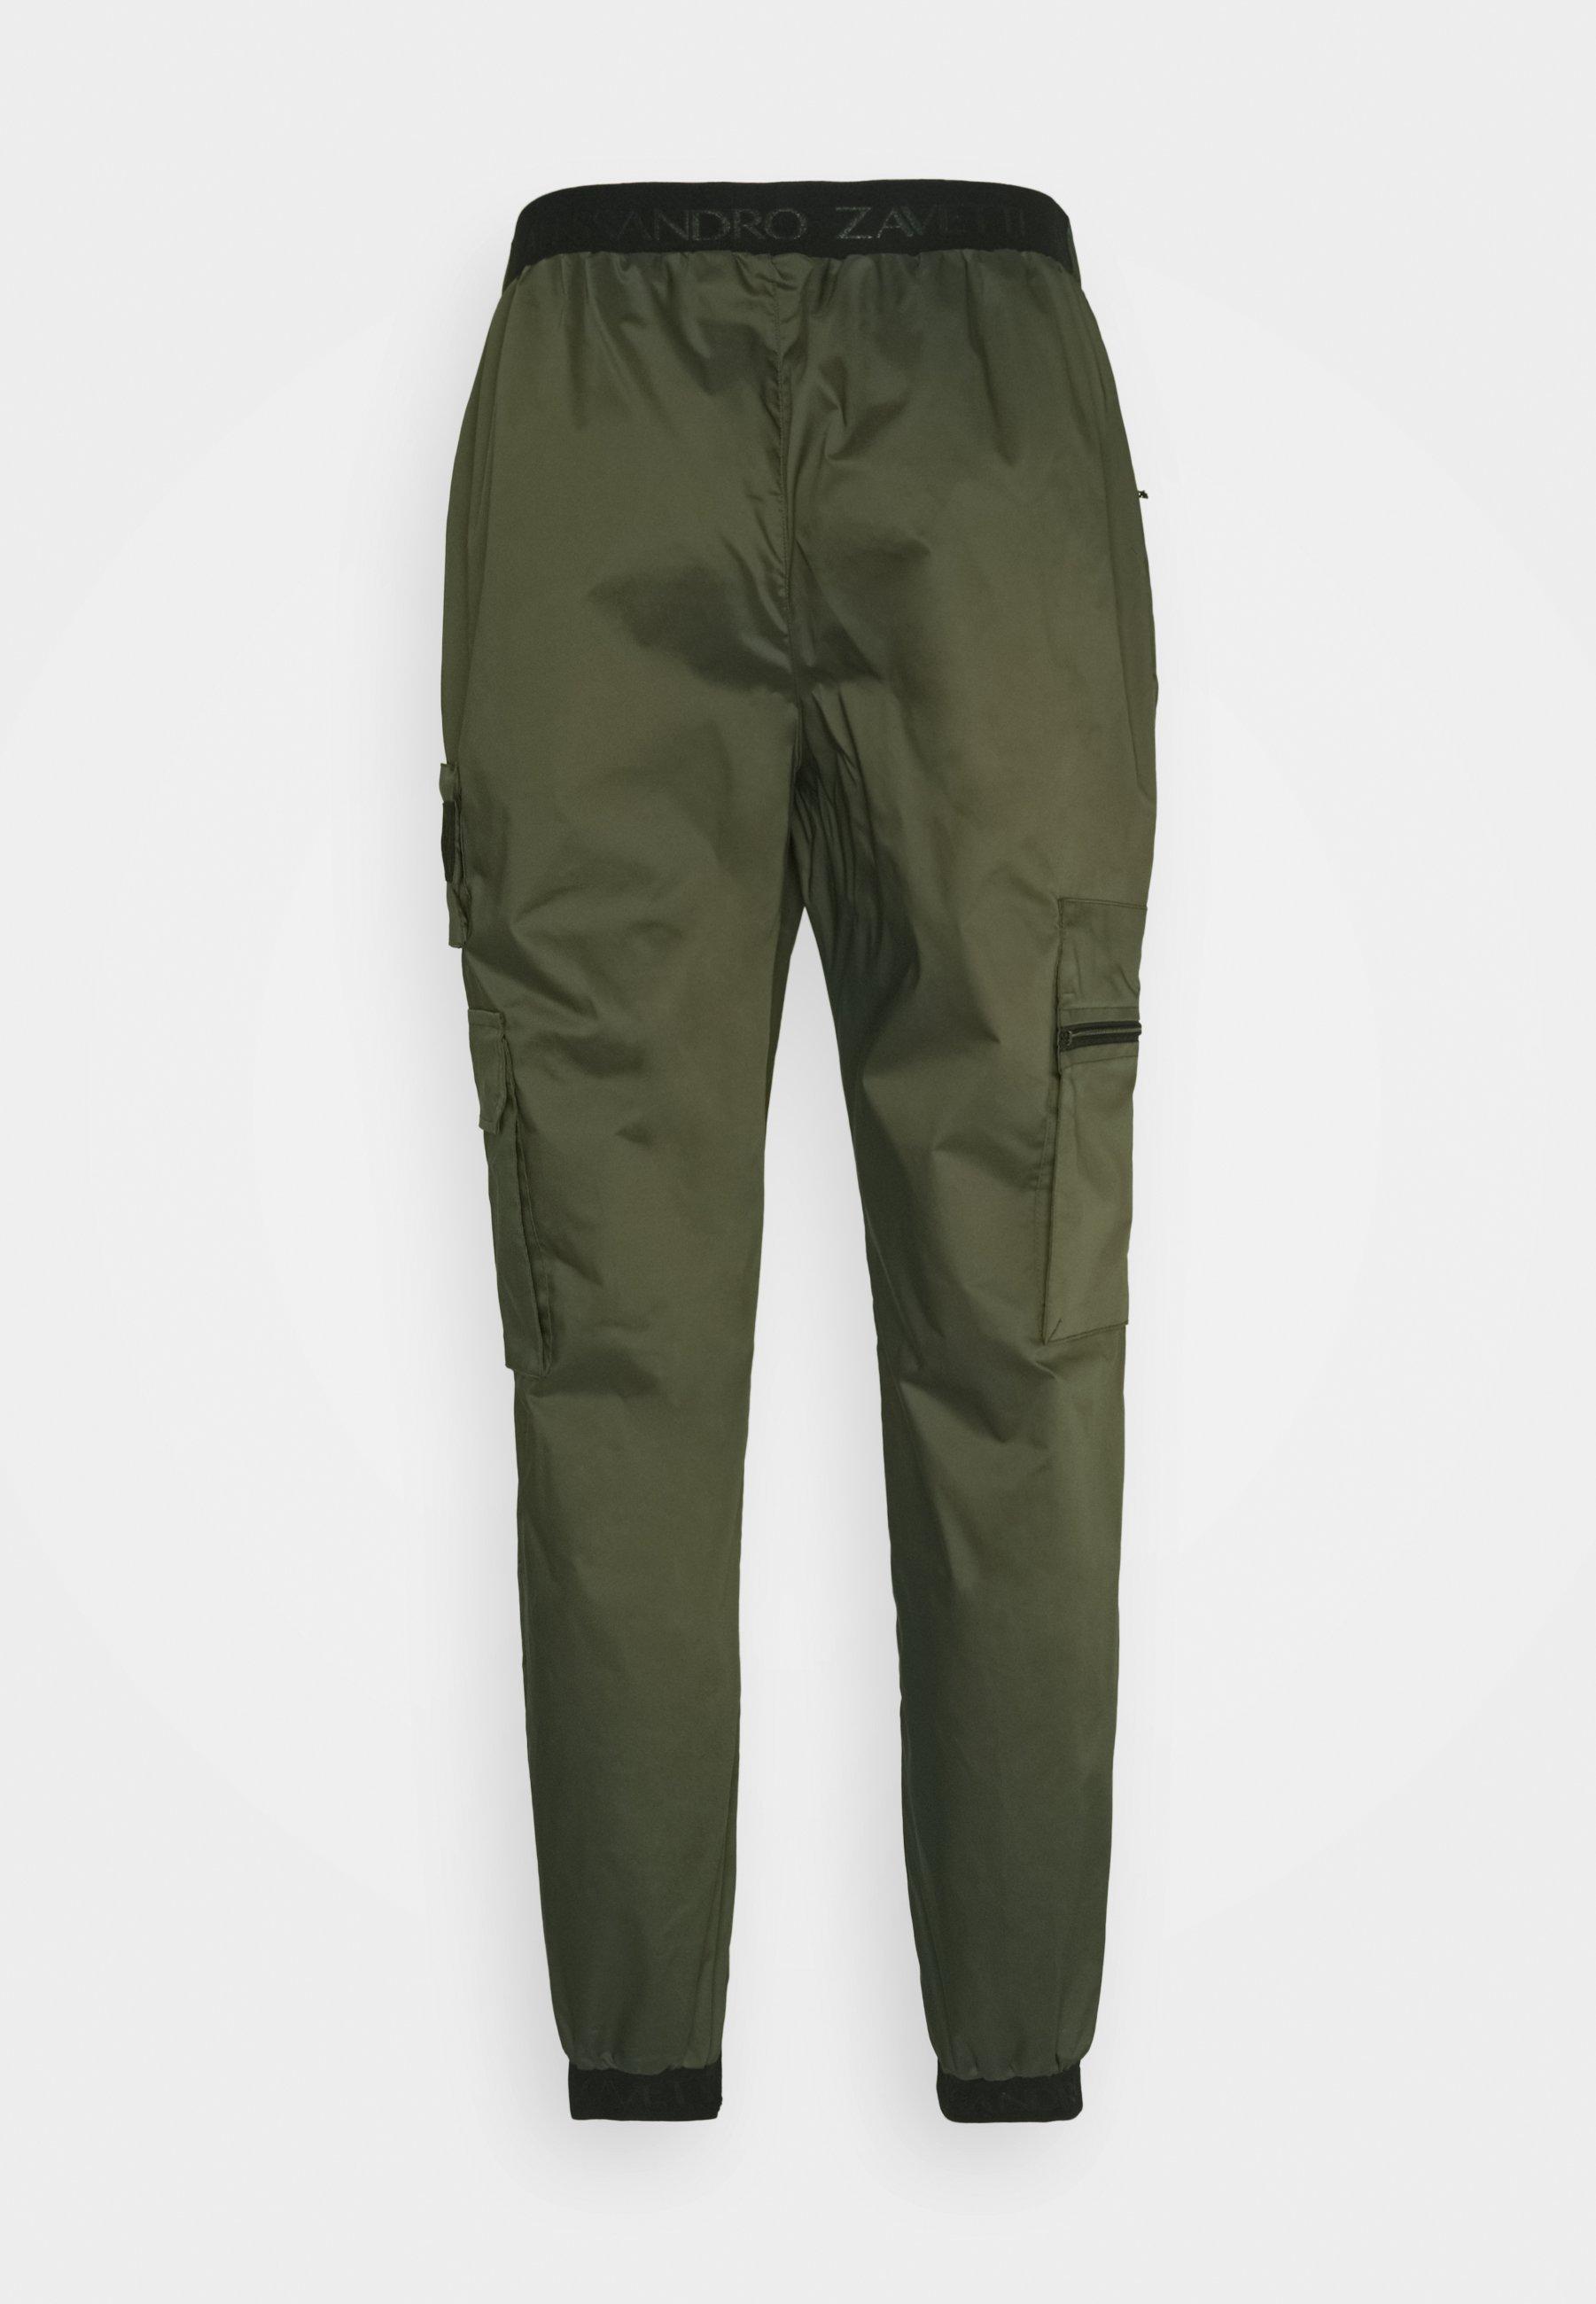 Homme ARANOVA COMBAT - Pantalon cargo